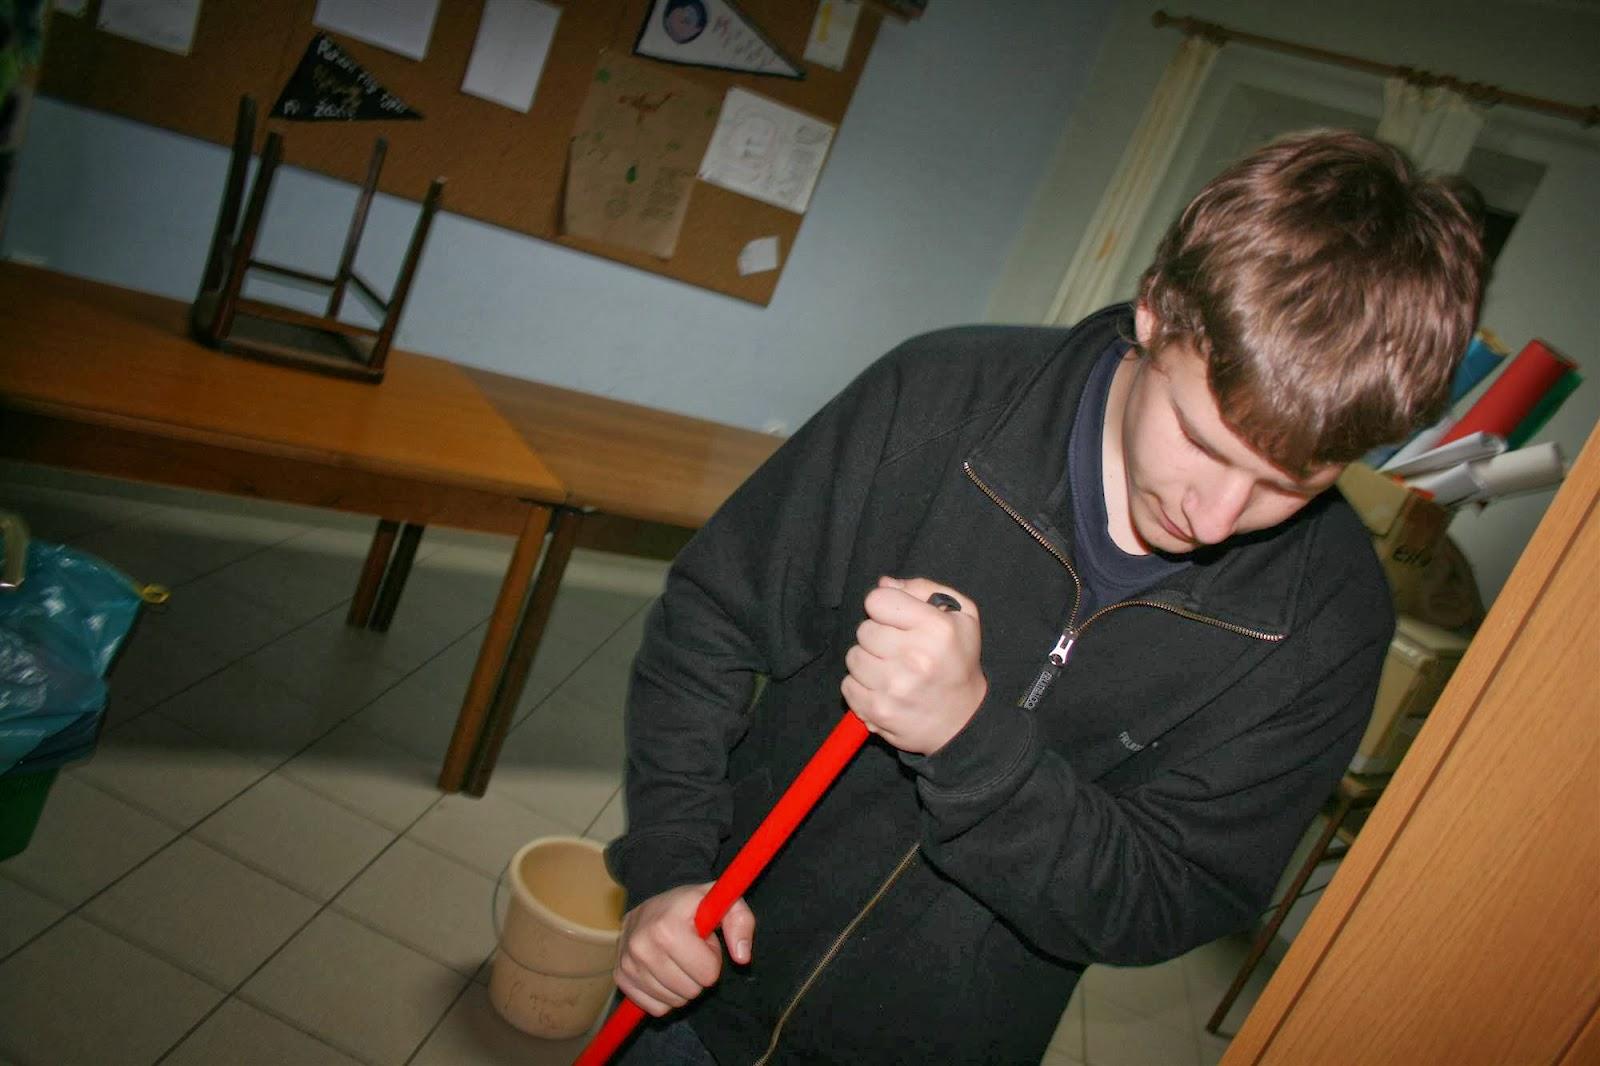 Čiščenje taborniške, Ilirska Bistrica 2007 - IMG_4068.jpg